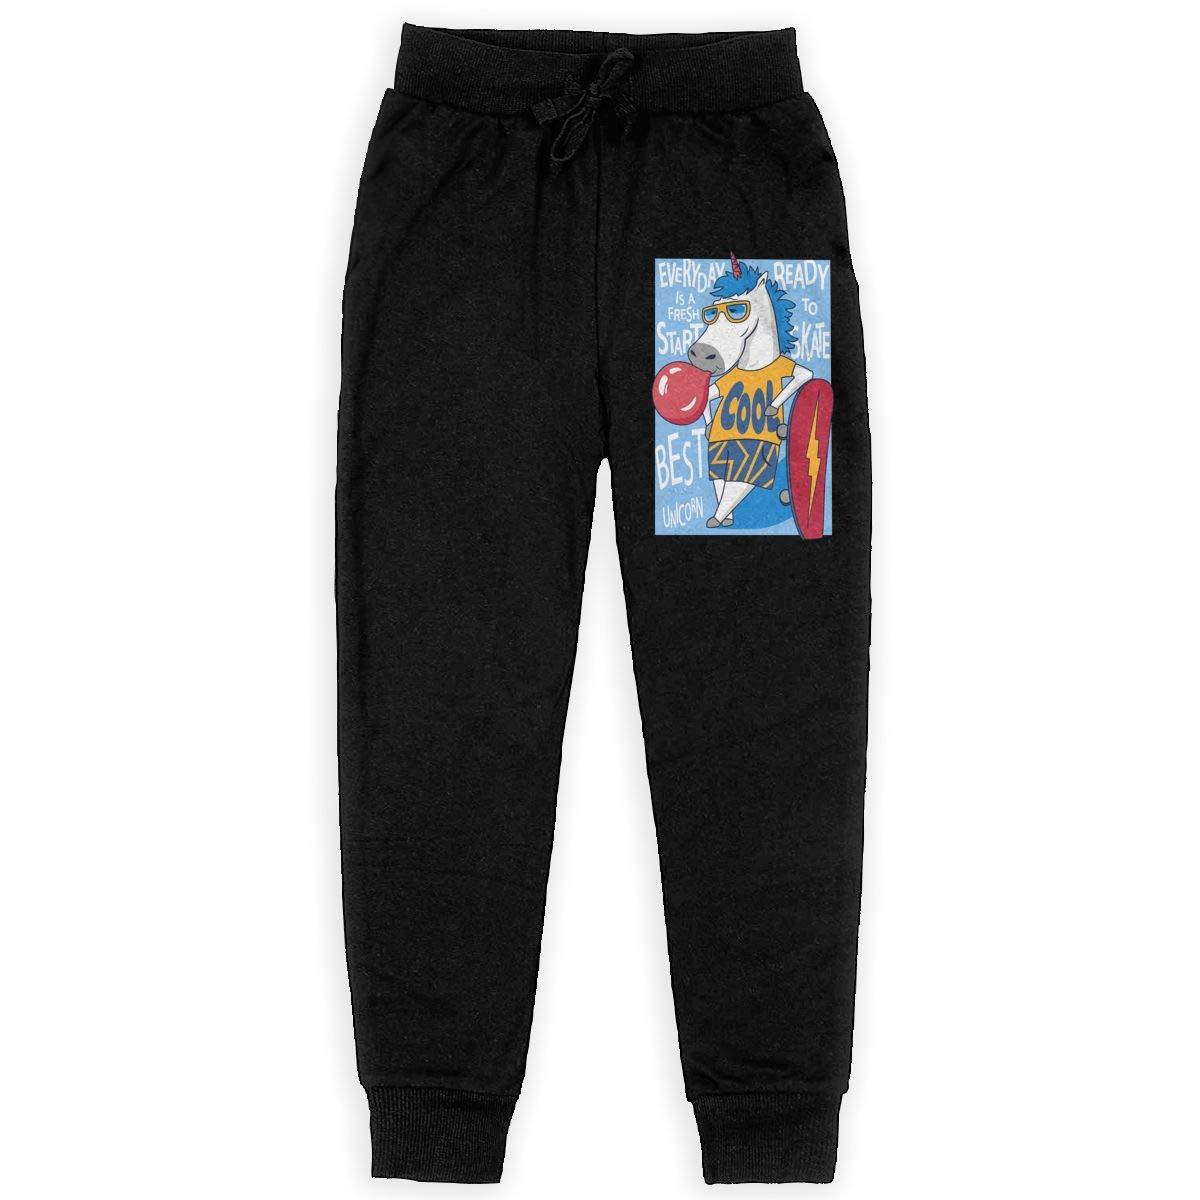 Boys Cotton Jogger Sweatpants Unicorn Skateboarder Adjustable Waist Trousers with Pocket